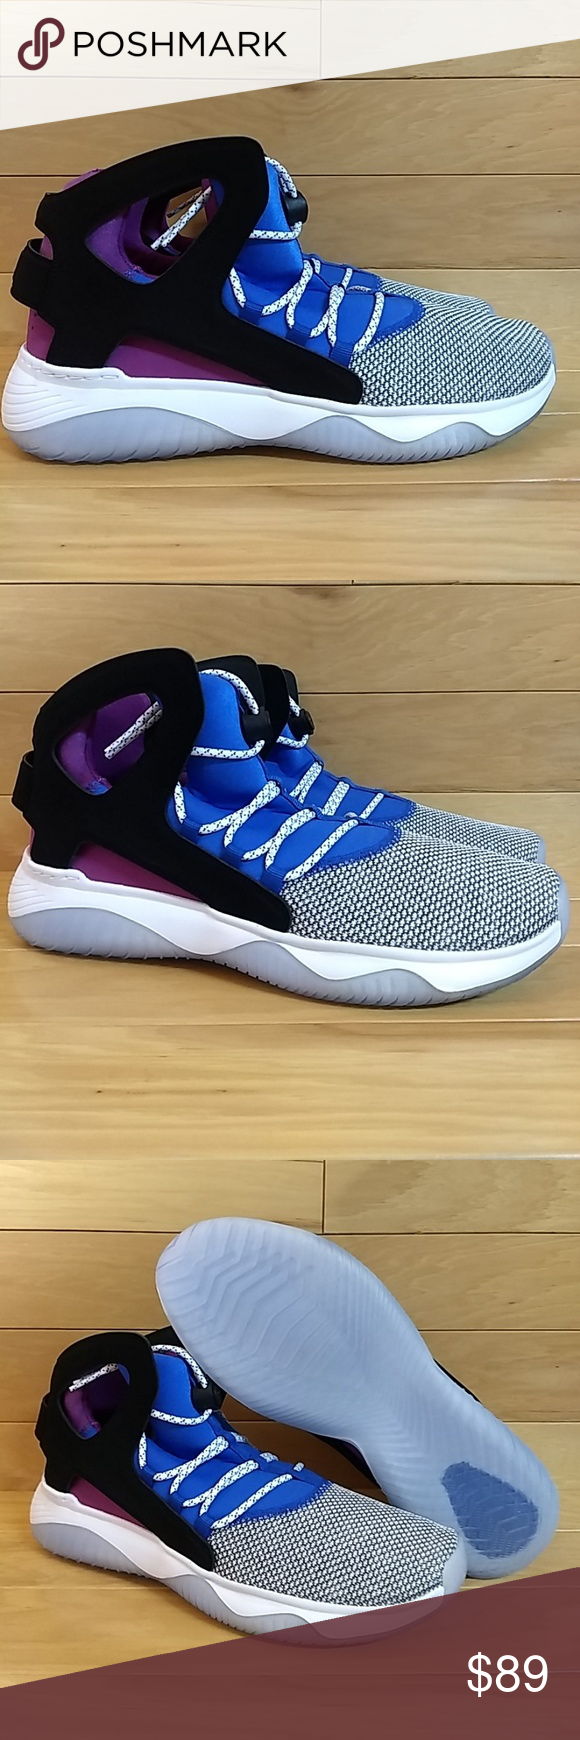 timeless design 63115 0397c Nike Air Flight Huarache Ultra Basketball Shoe Item  Nike Air Flight  Huarache Ultra Code